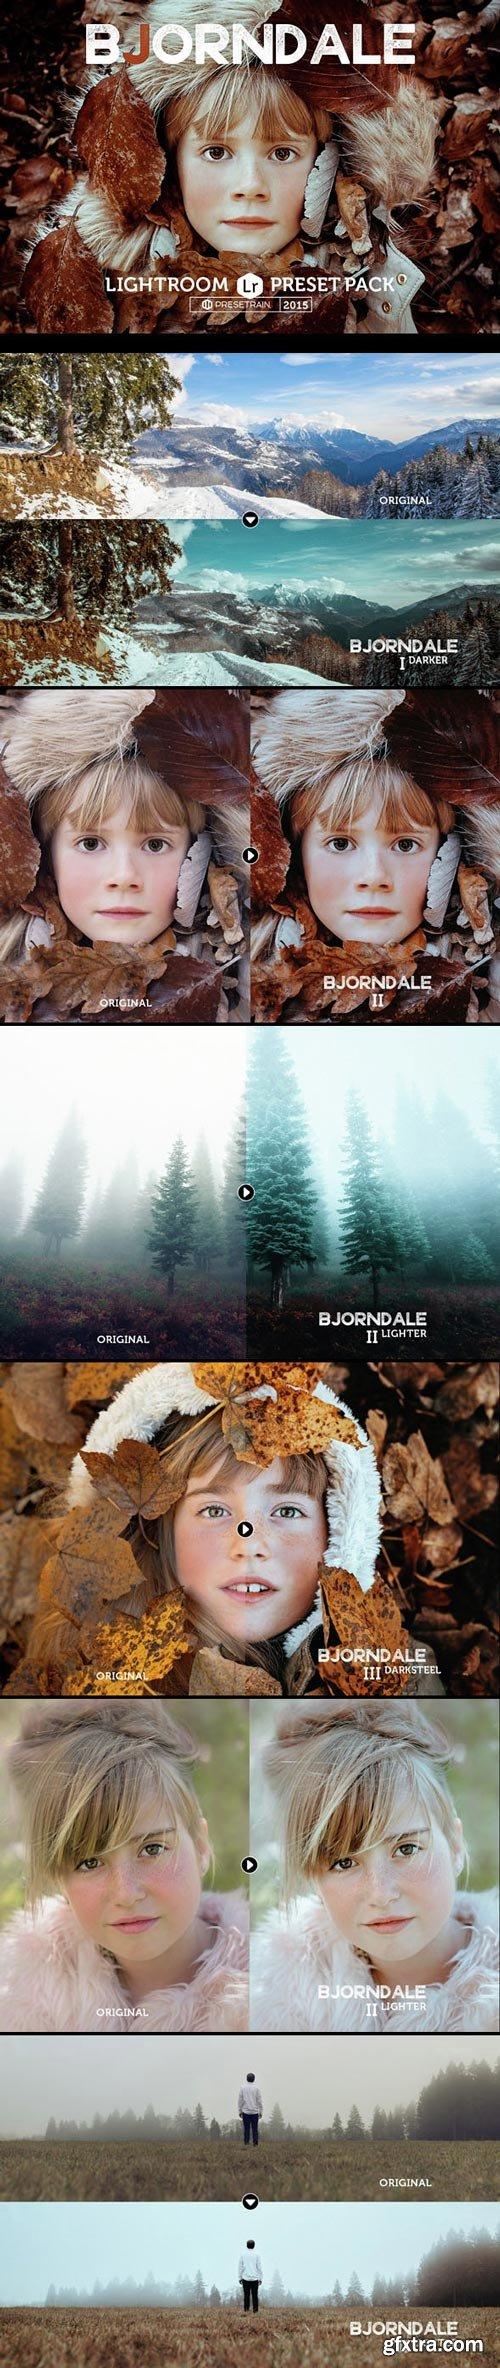 GraphicRiver - Bjorndale Lightroom Preset Pack - 14561024